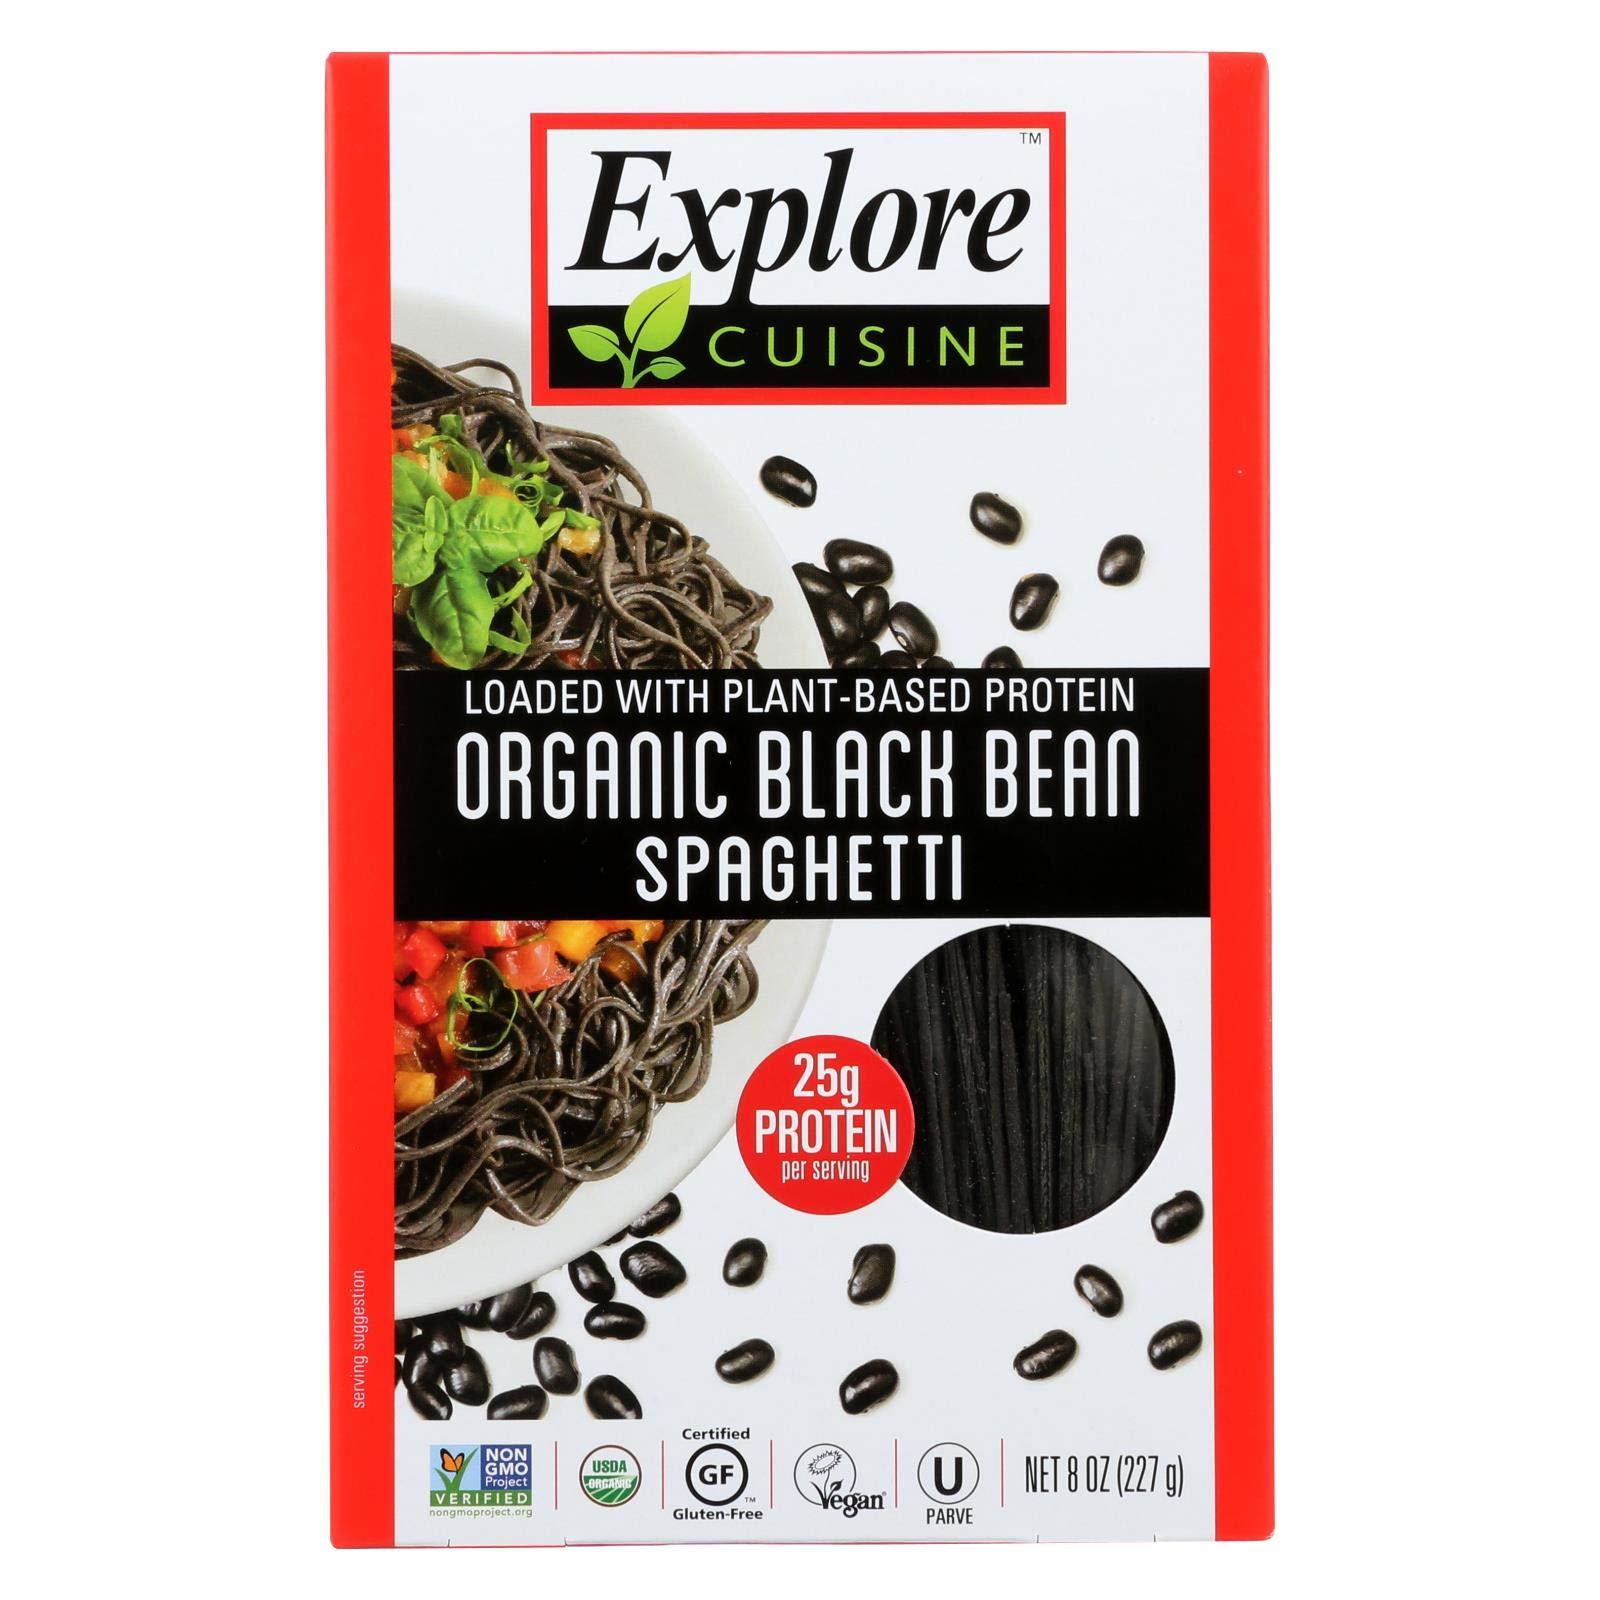 Explore Cuisine Organic Black Bean Spaghetti - Spaghetti - Case Of 6-8 Oz. by EXPLORE CUISINE